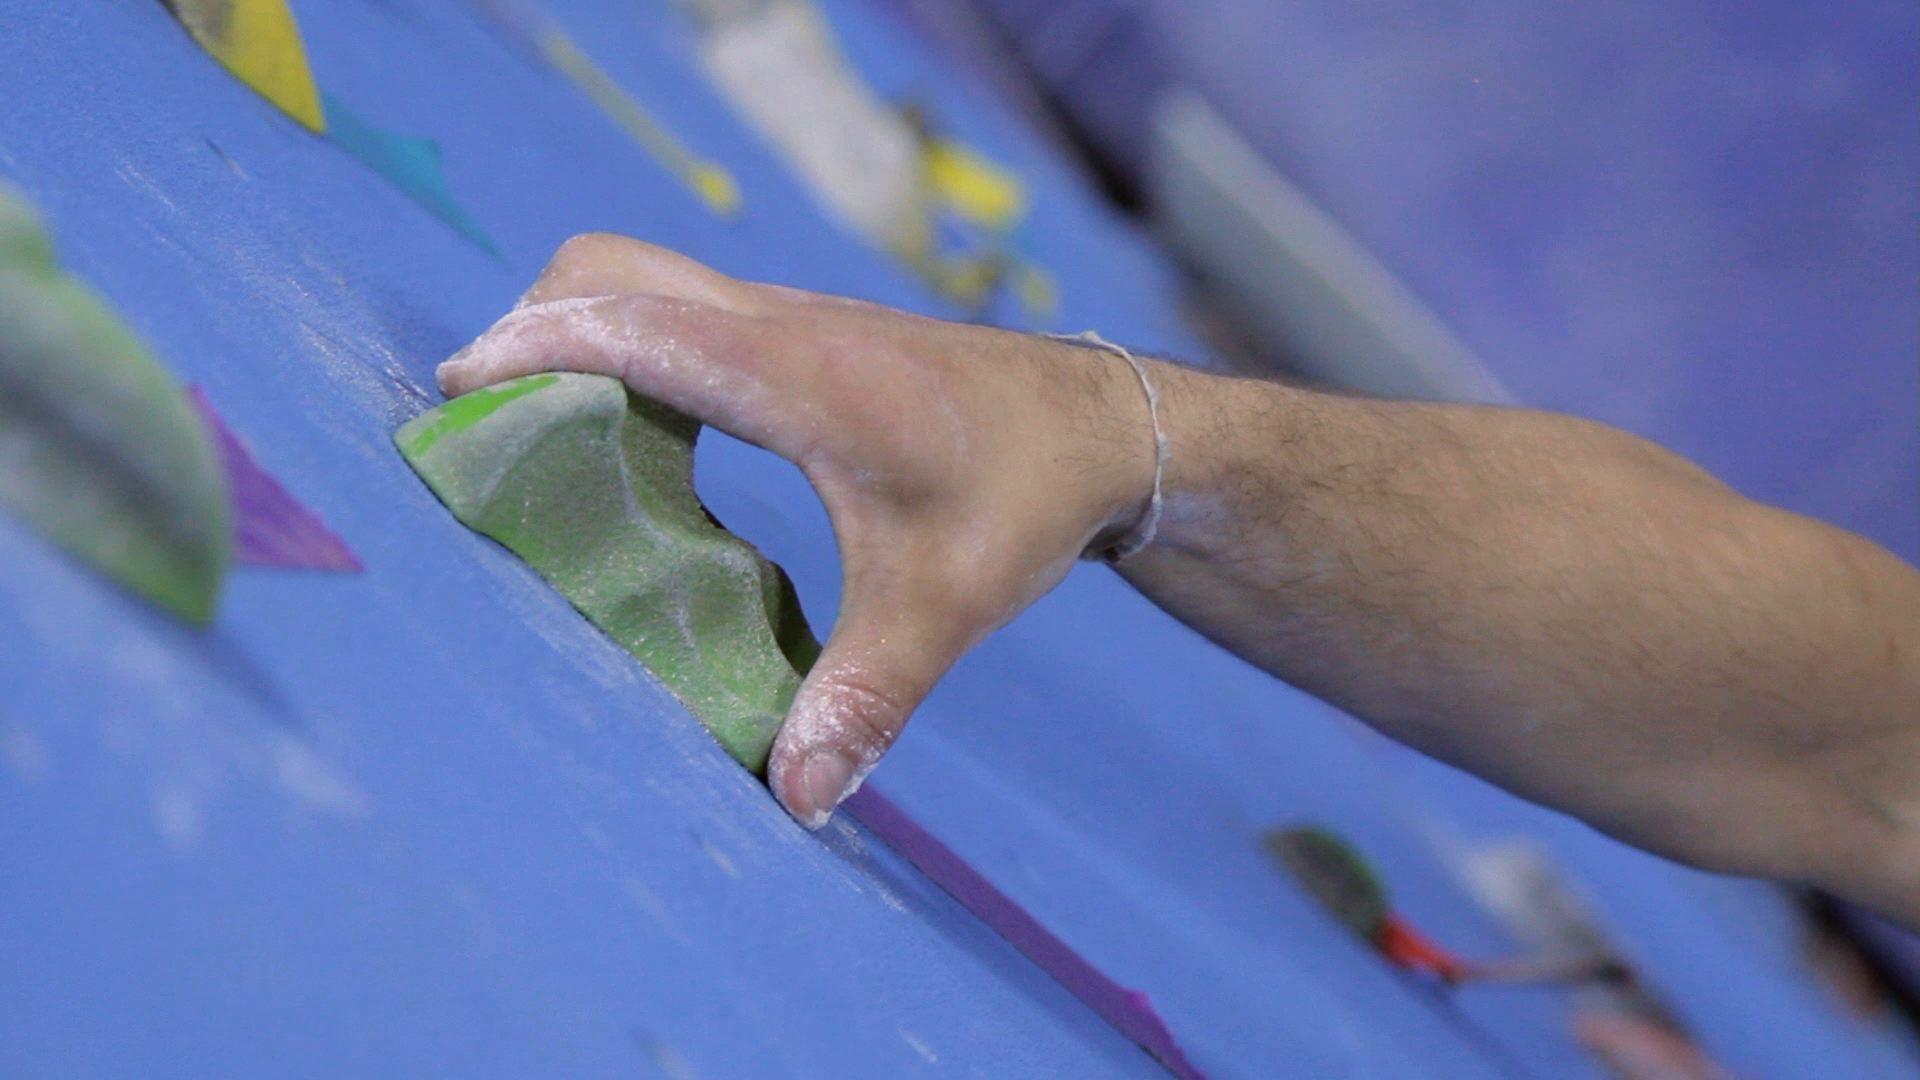 Sports Wallpaper: Indoor Rock Climbing Wallpaper Free for HD.